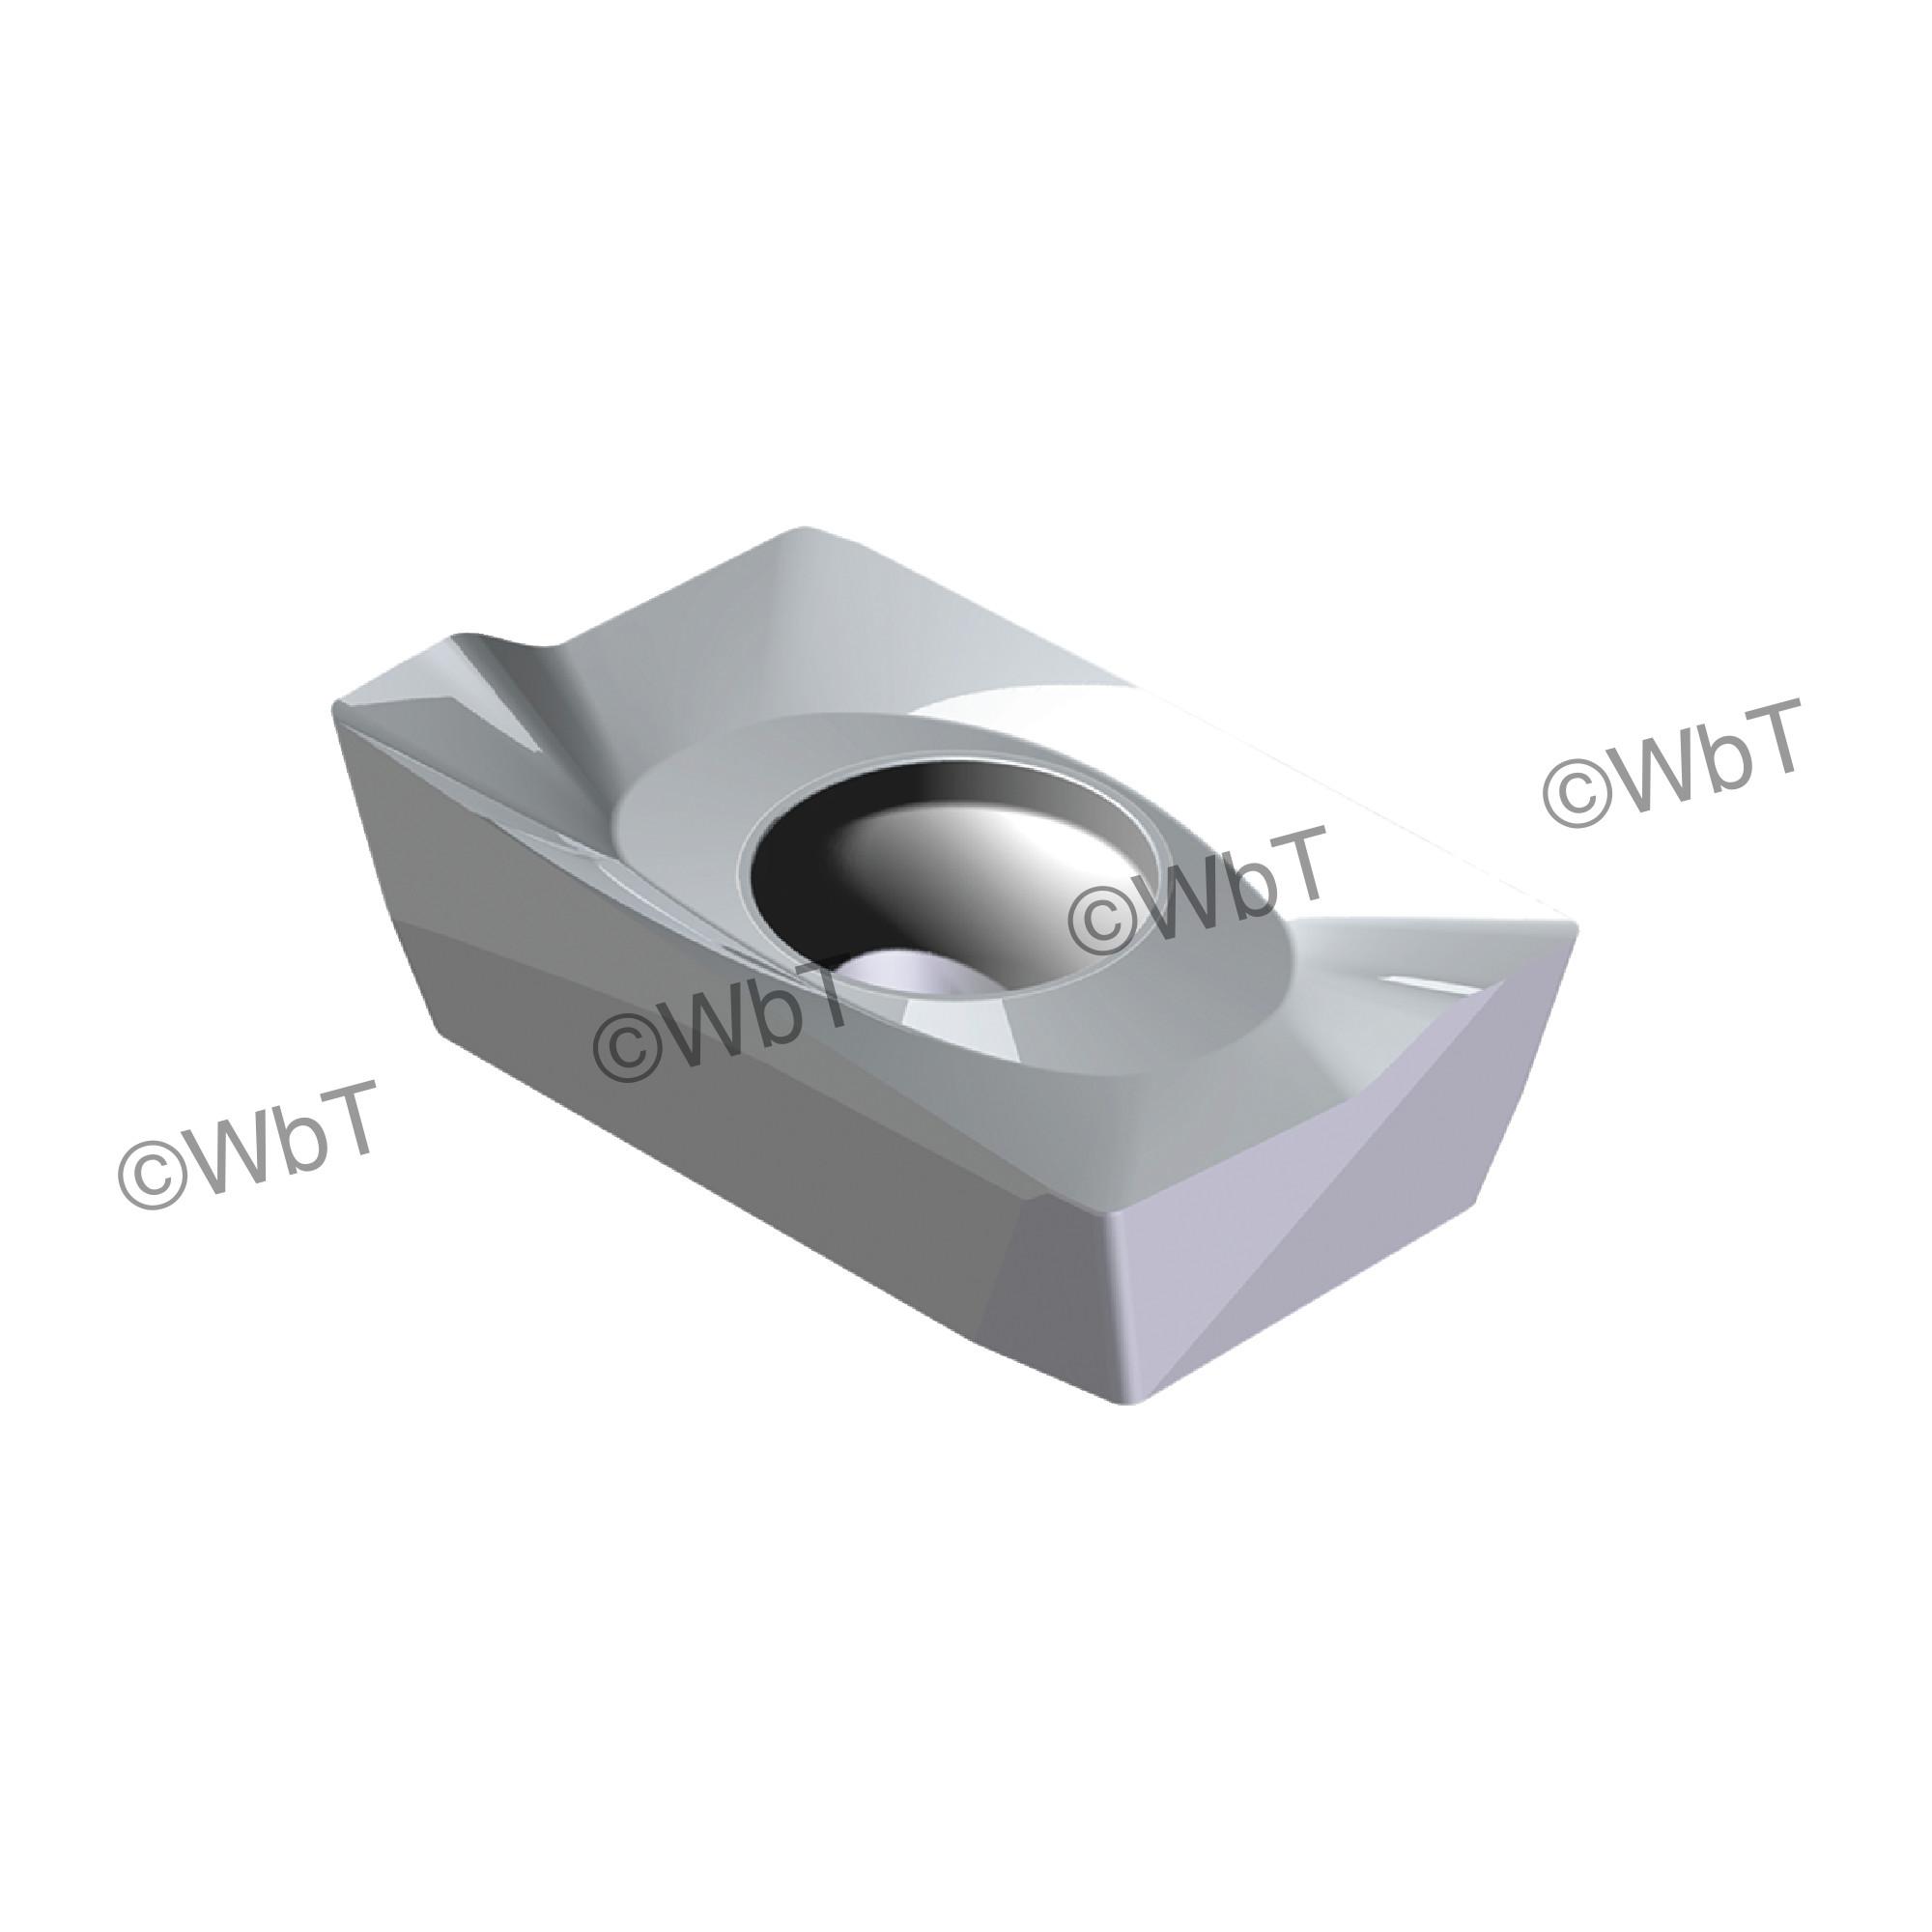 AKUMA - ADKT1505PDFR-N1 JM10N Parallelogram / Indexable Carbide Milling Insert